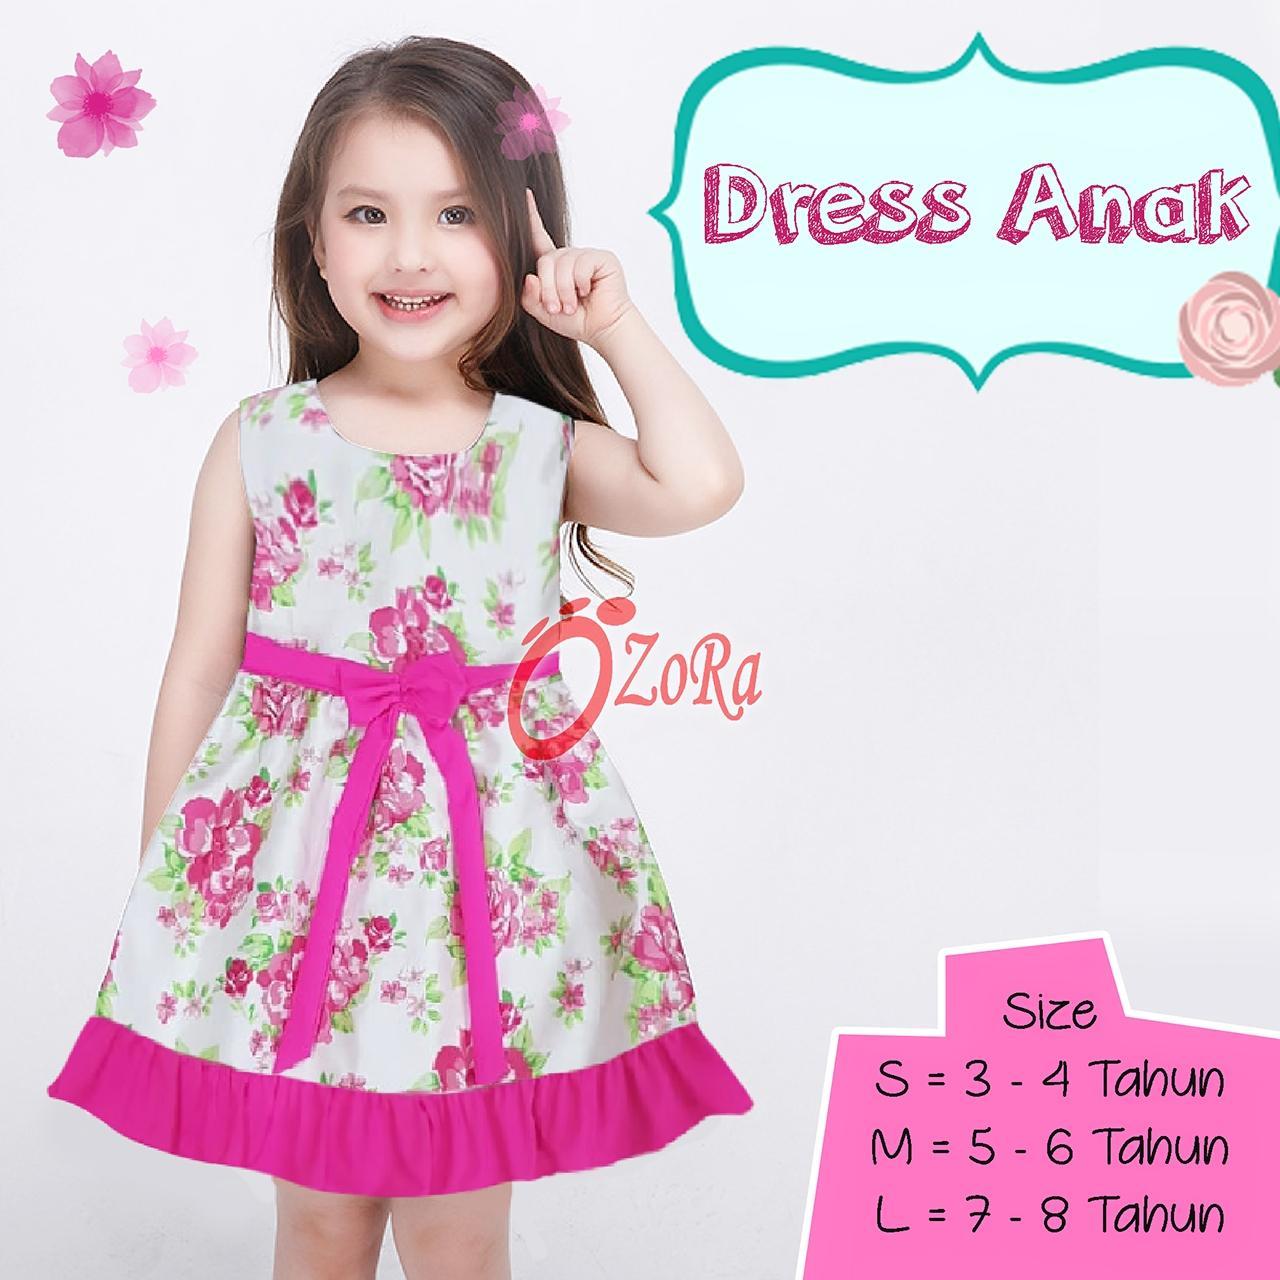 Ozora Dress Anak Perempuan 3-8 tahun Gaun Pesta Anak Wanita Polkadot Import Branded